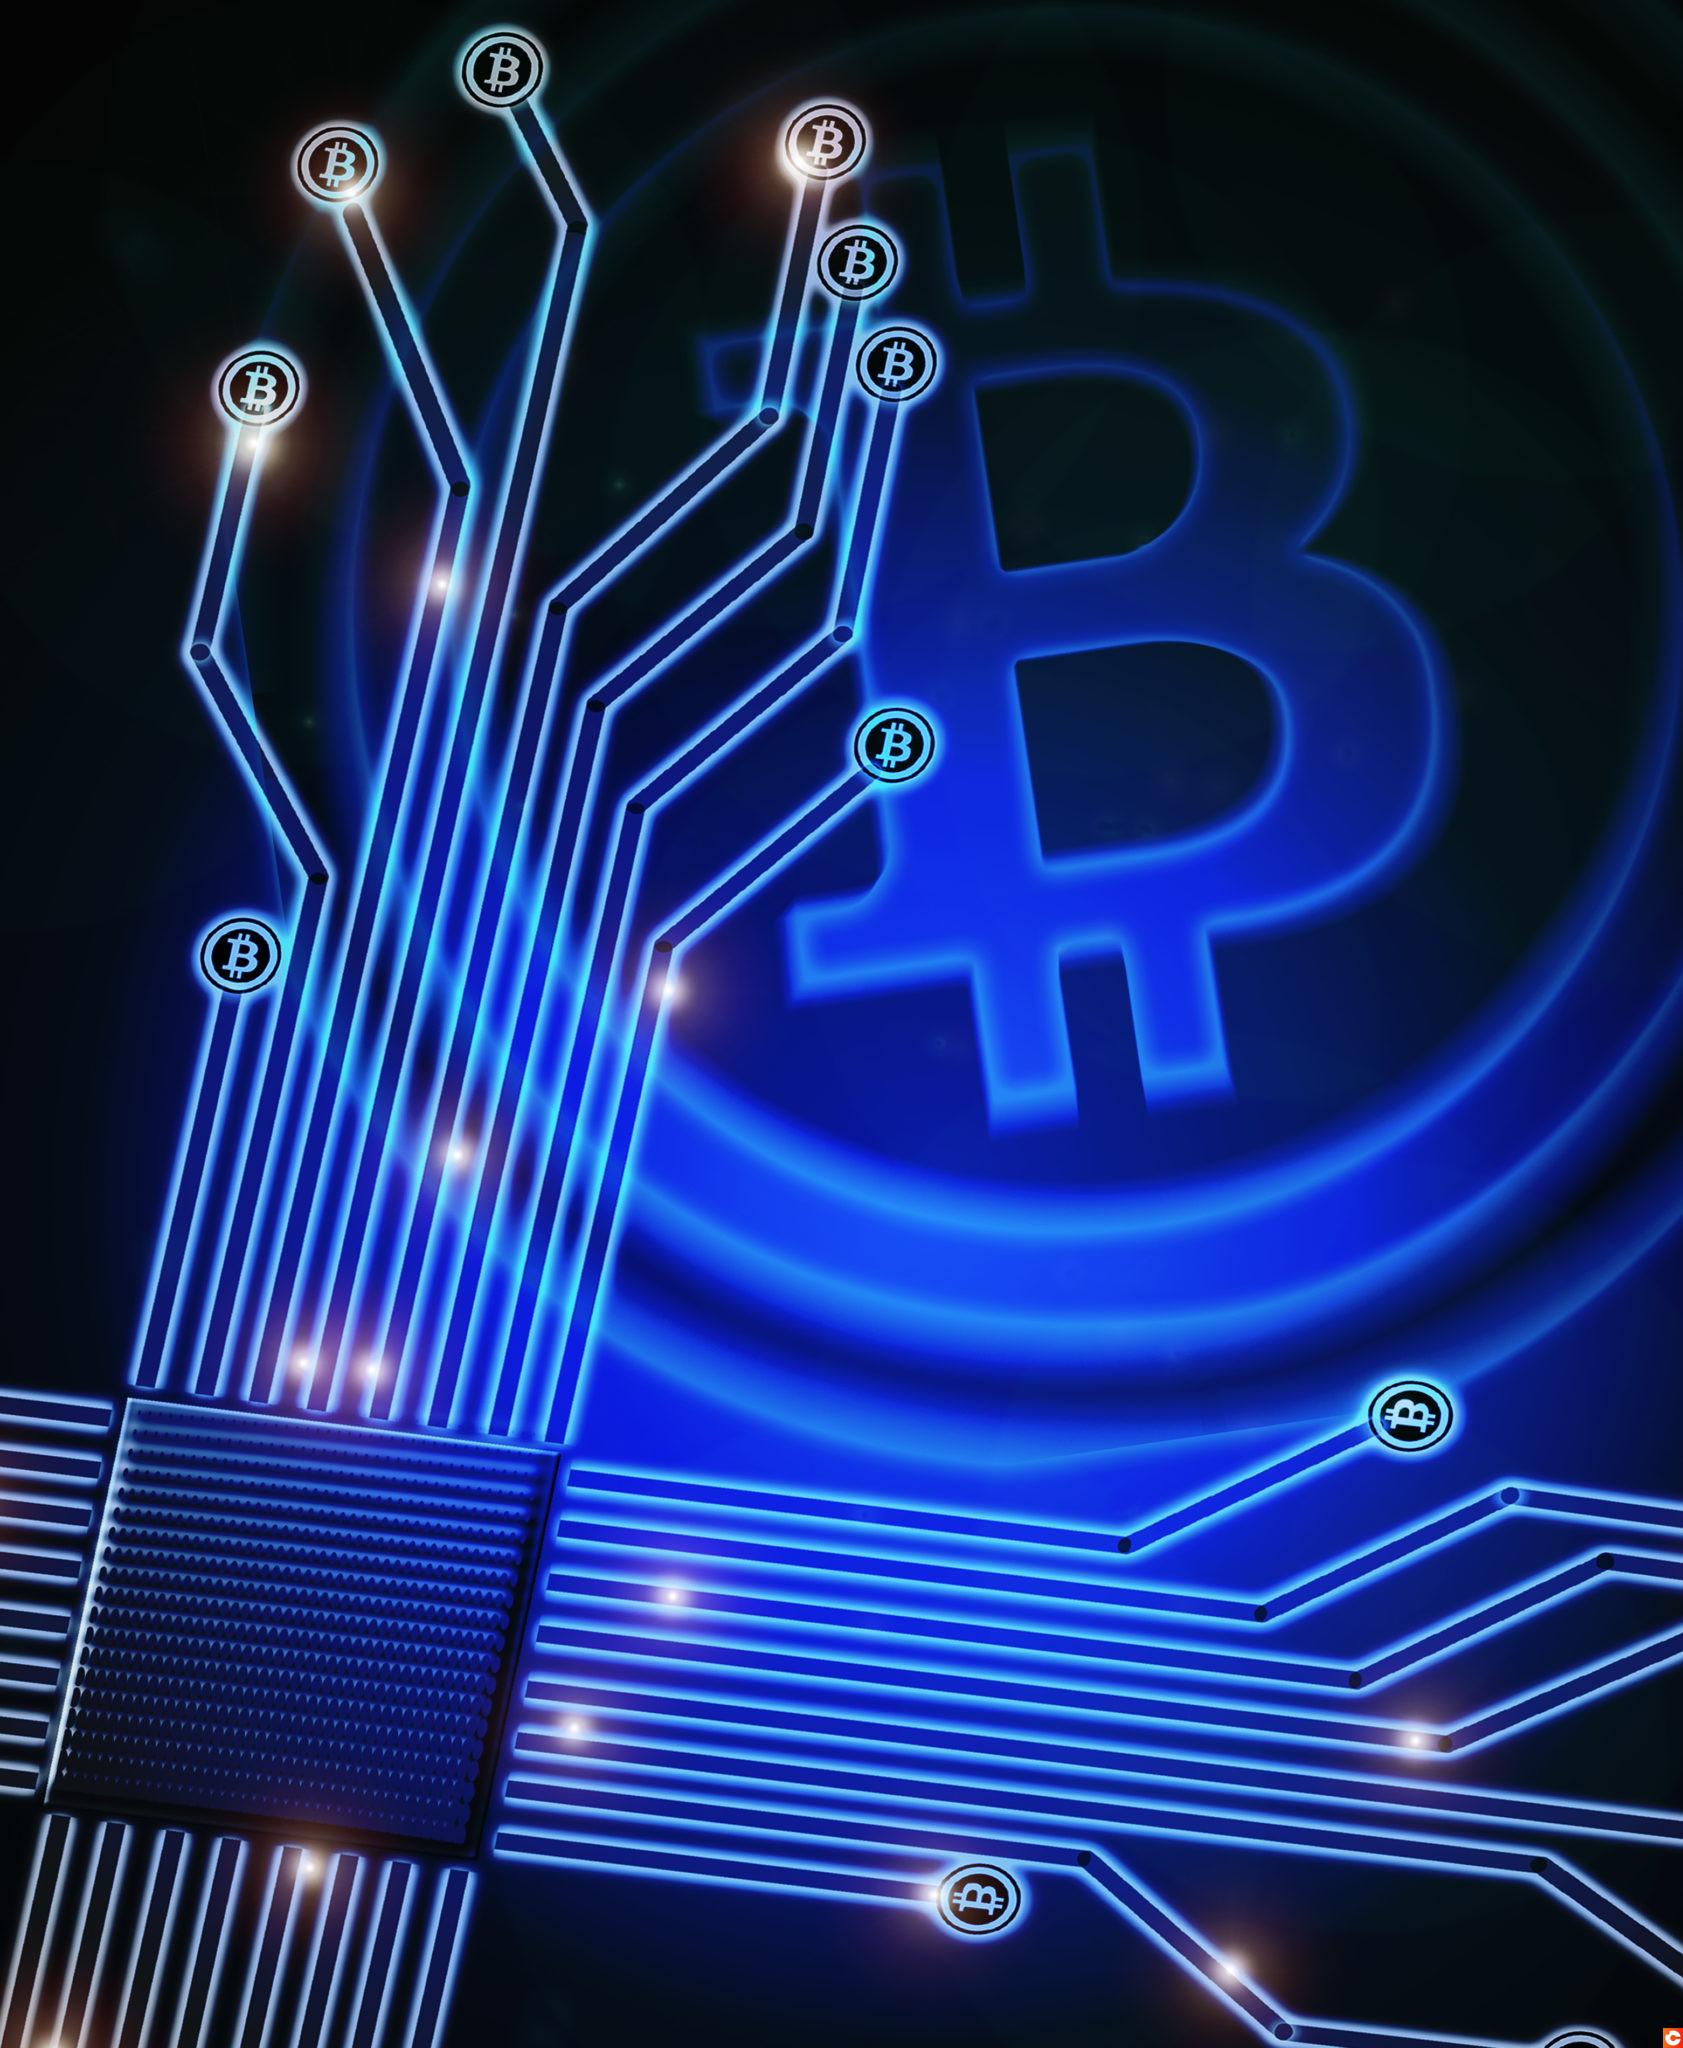 bitcoin background digital illustration